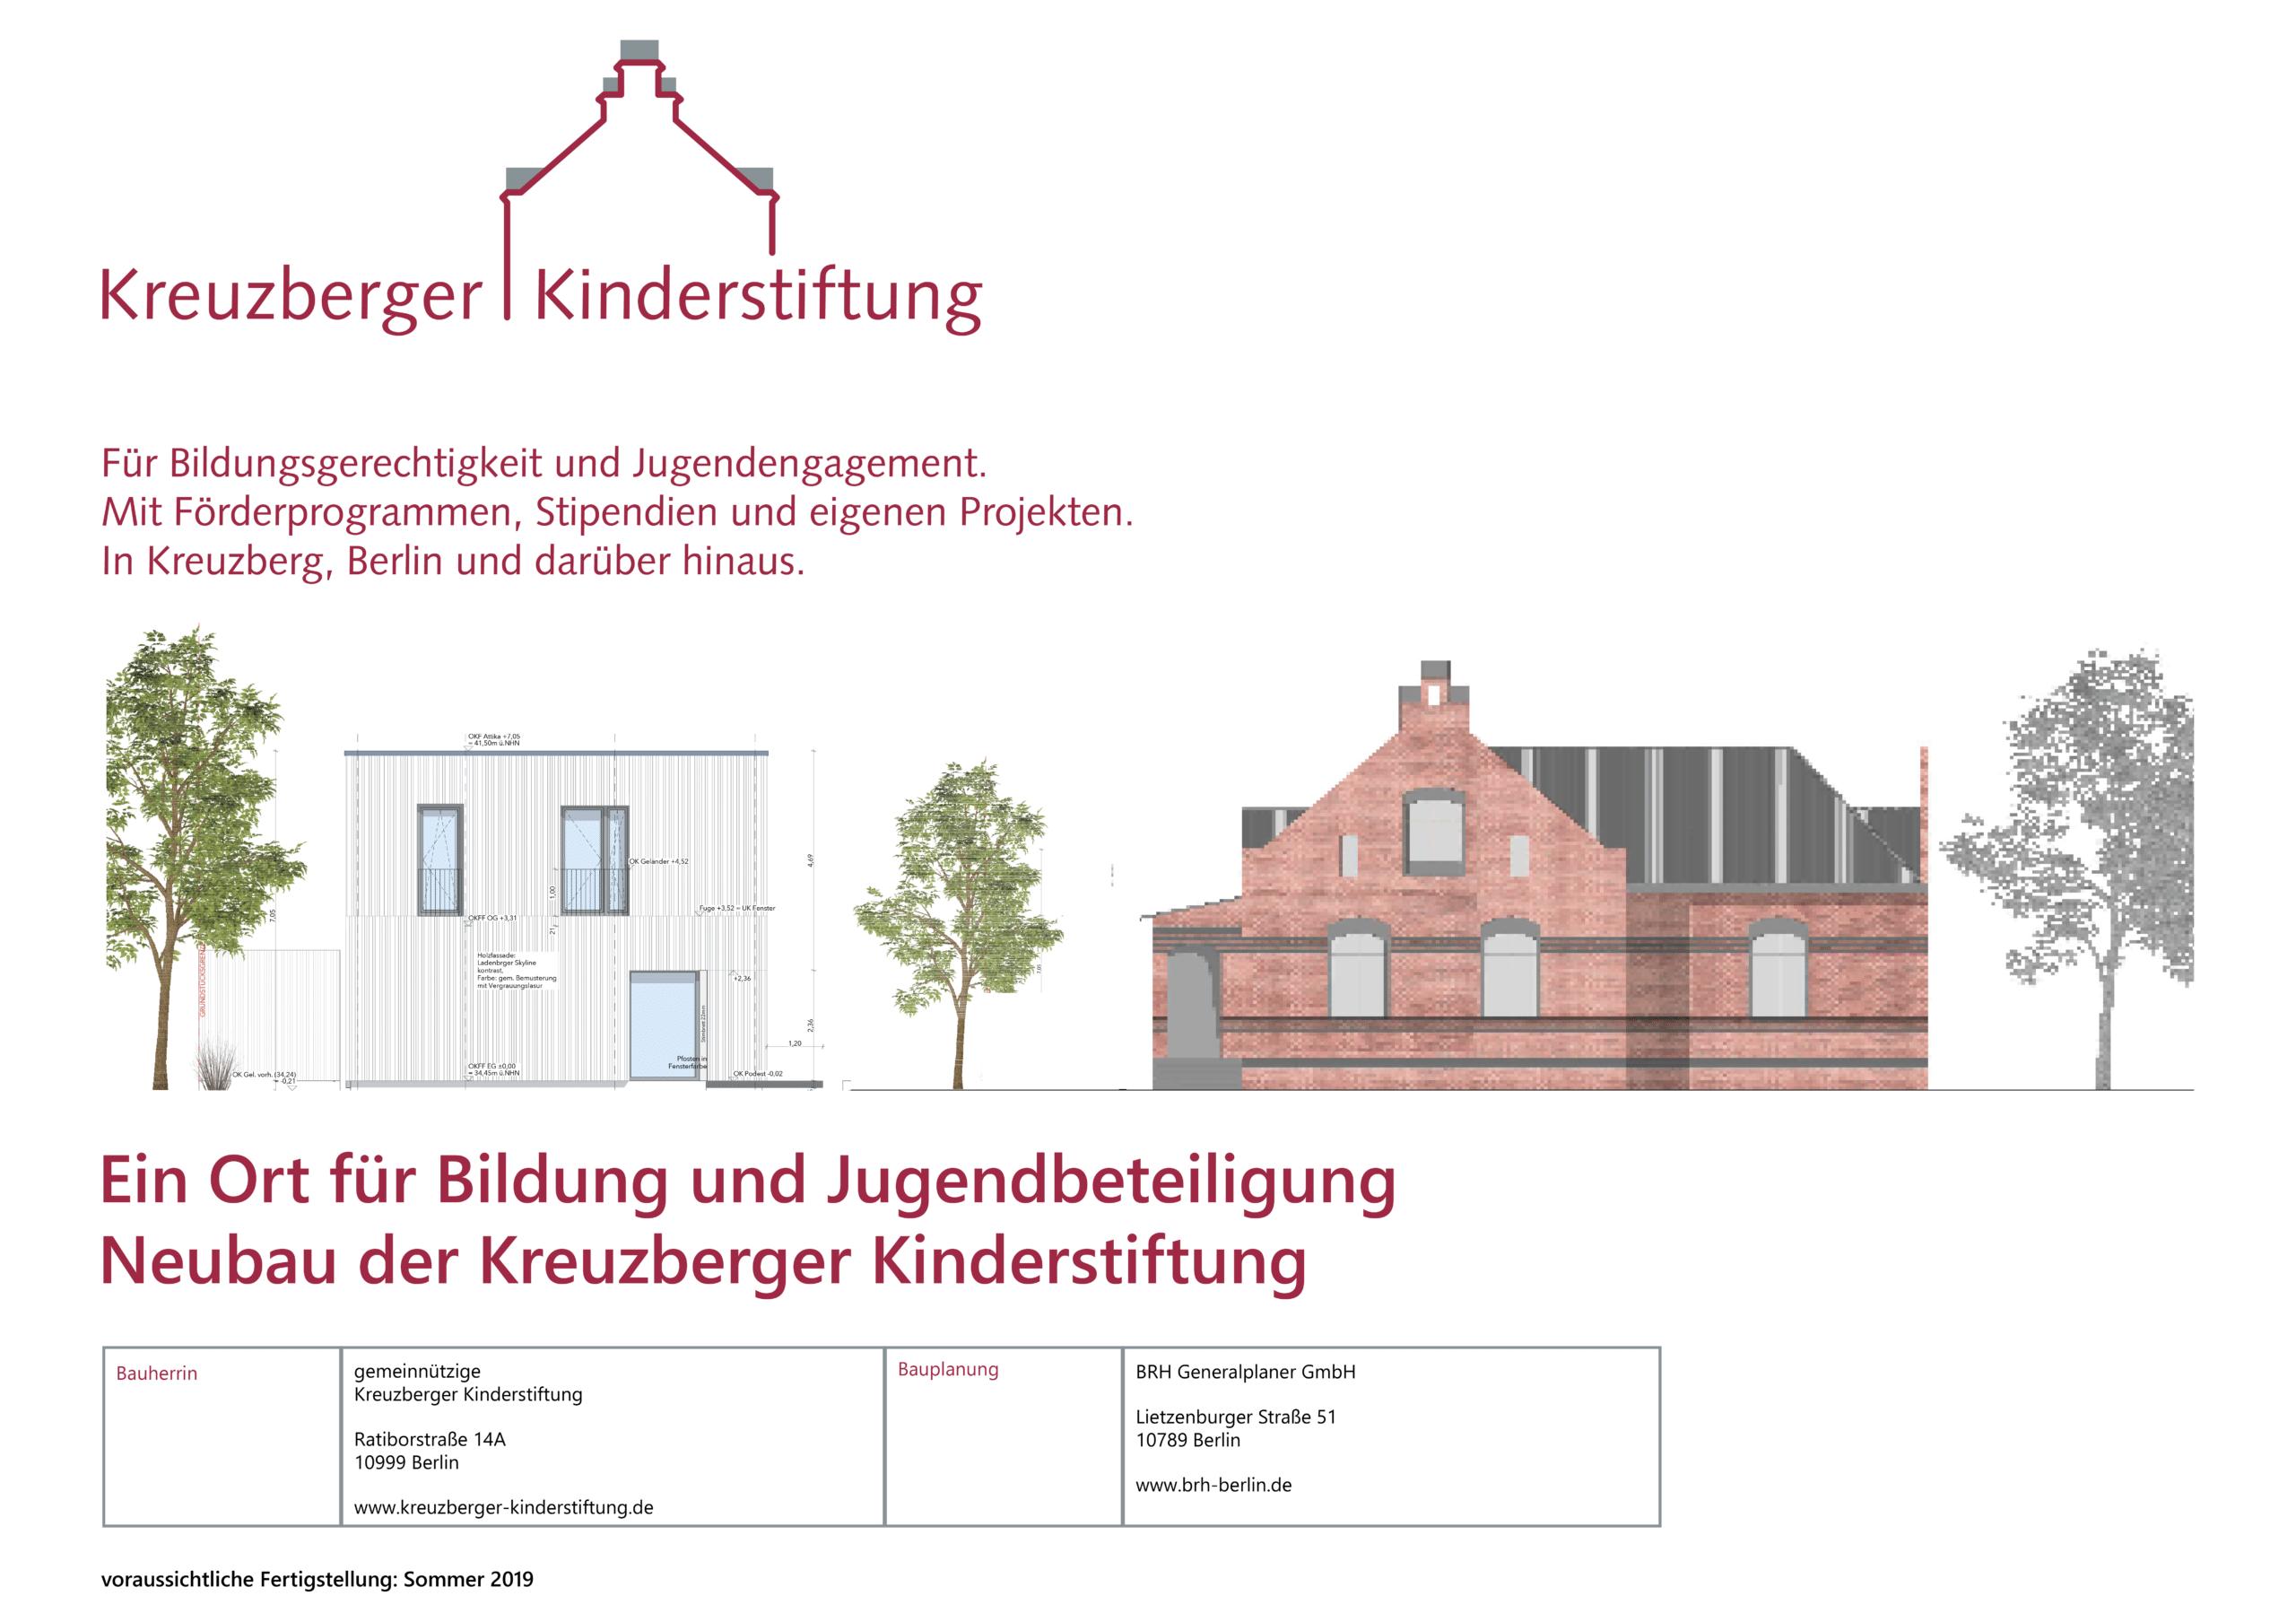 Kreuzberger Kinderstiftung Bauschild Neubau